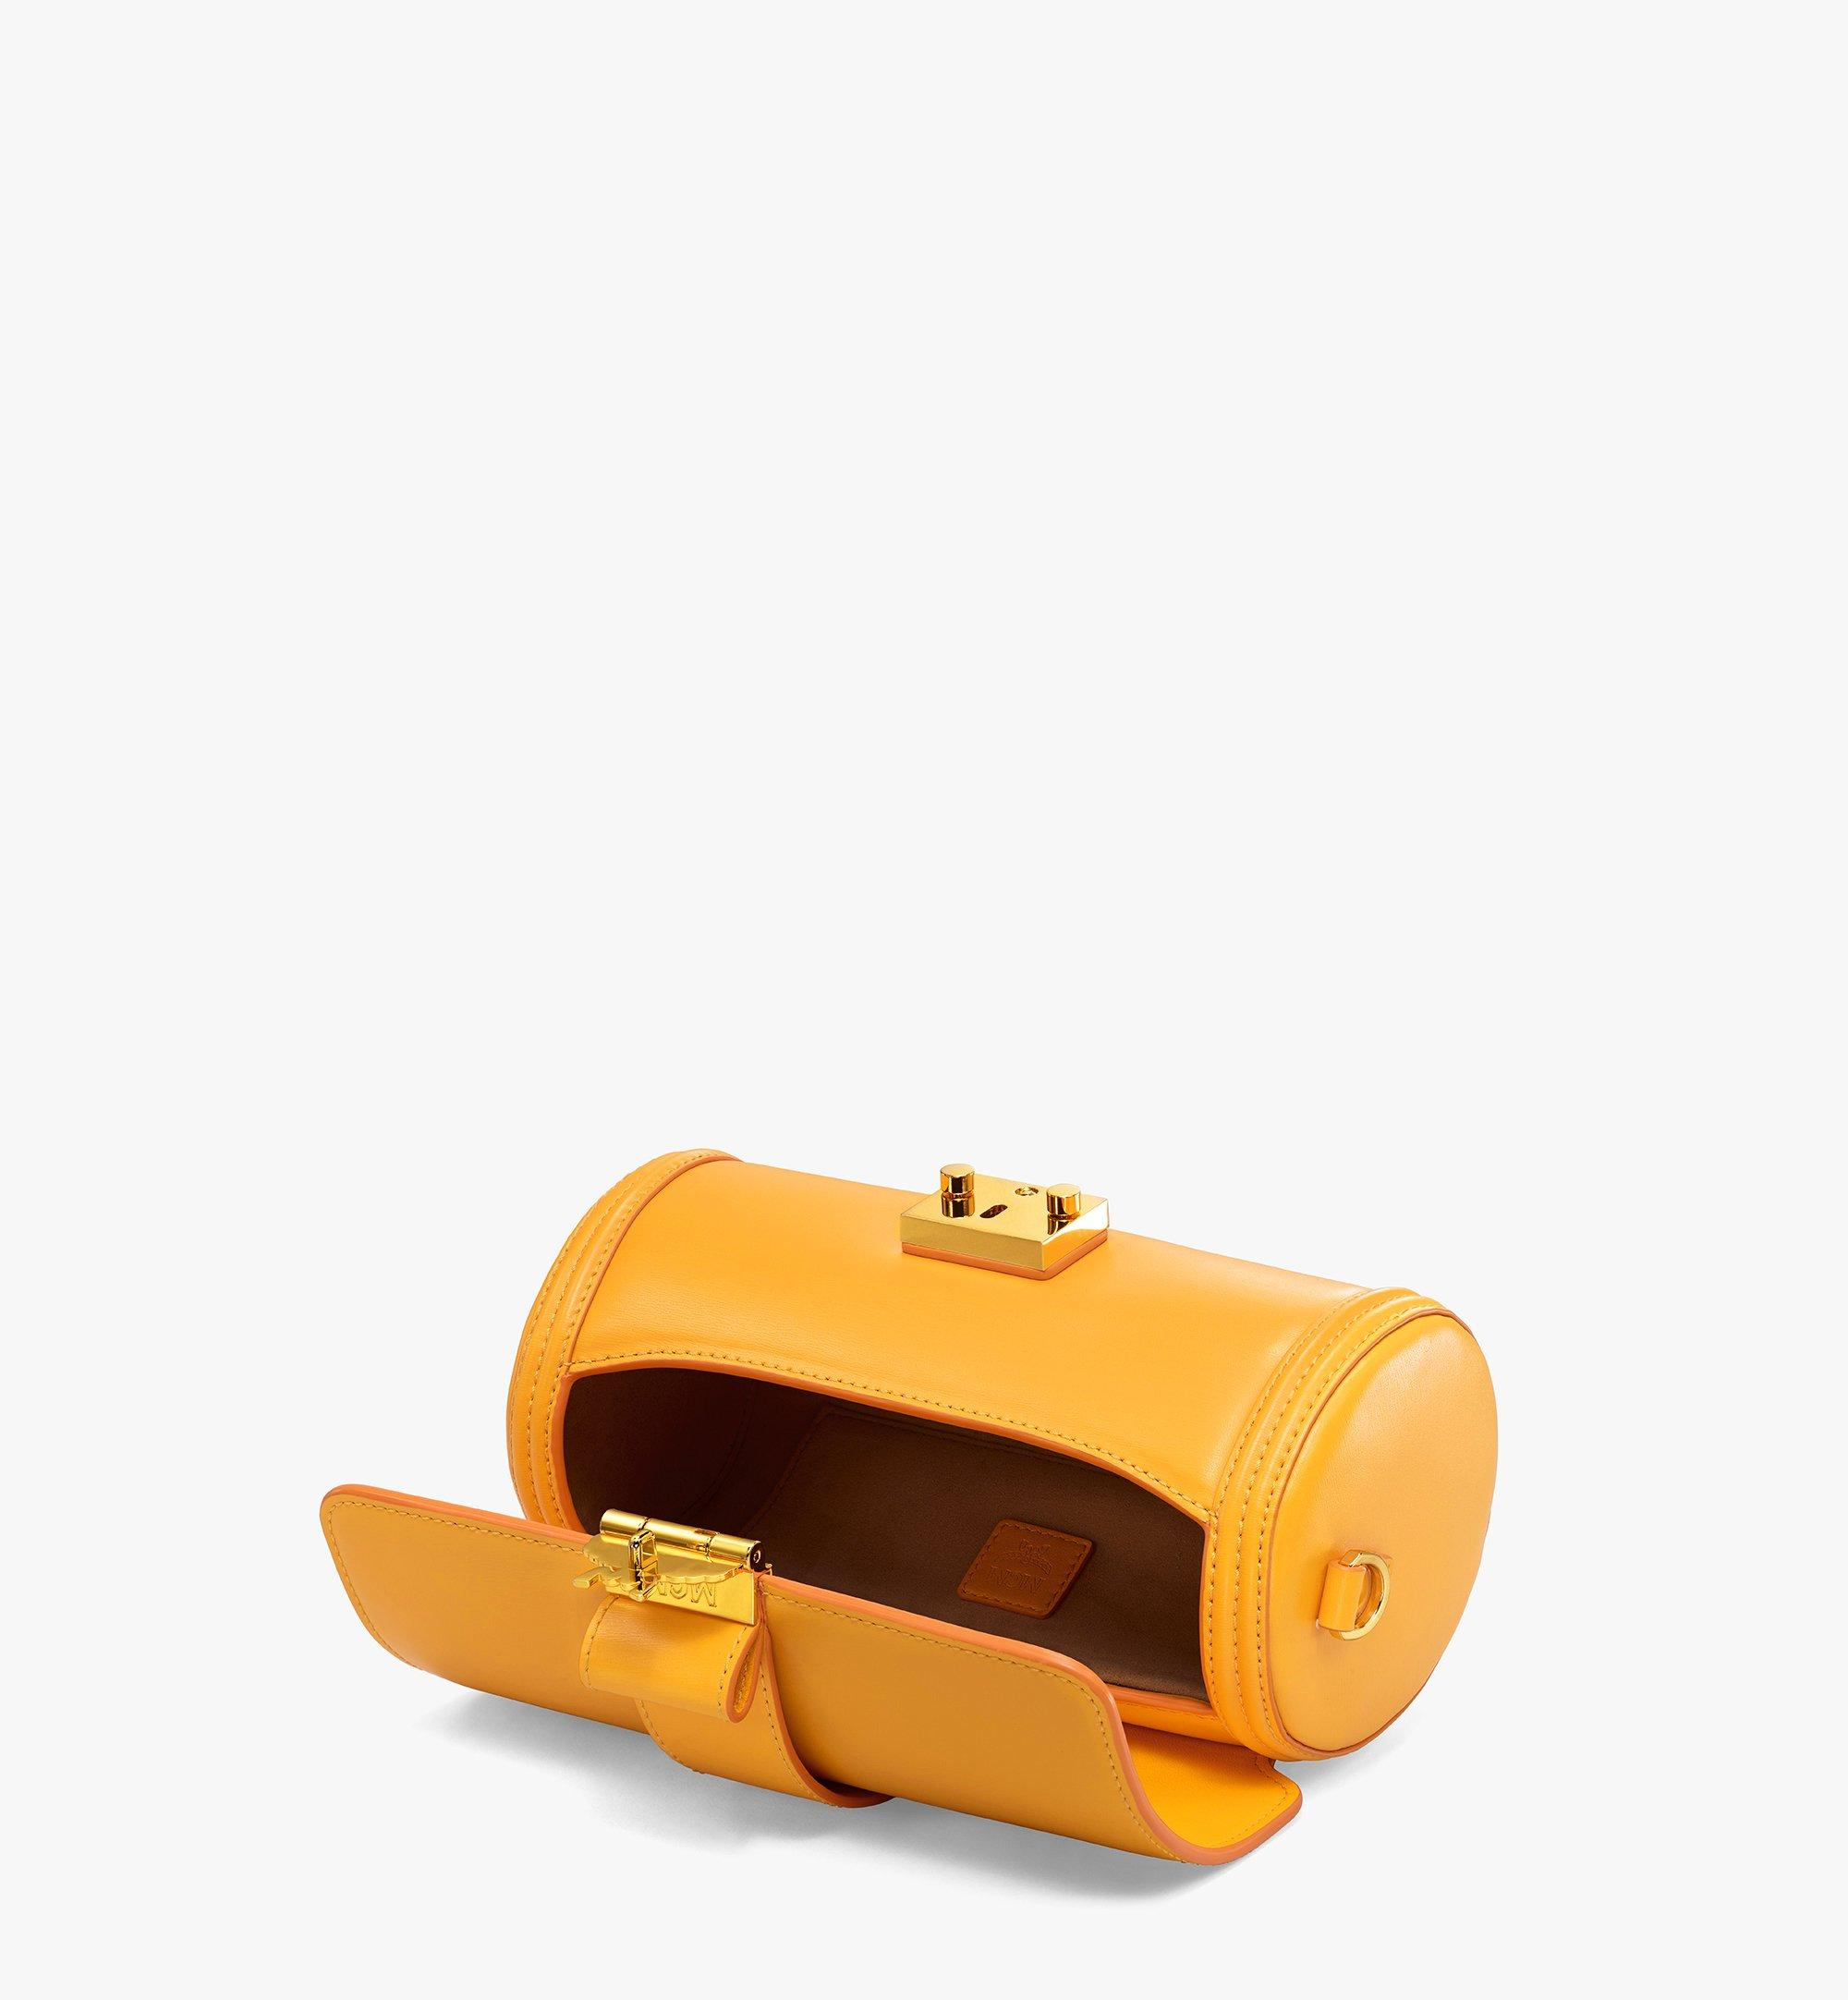 MCM 트레이시 엠보싱 스페니쉬 레더 크로스바디 Yellow MWRBSXT02Y2001 다른 각도 보기 2